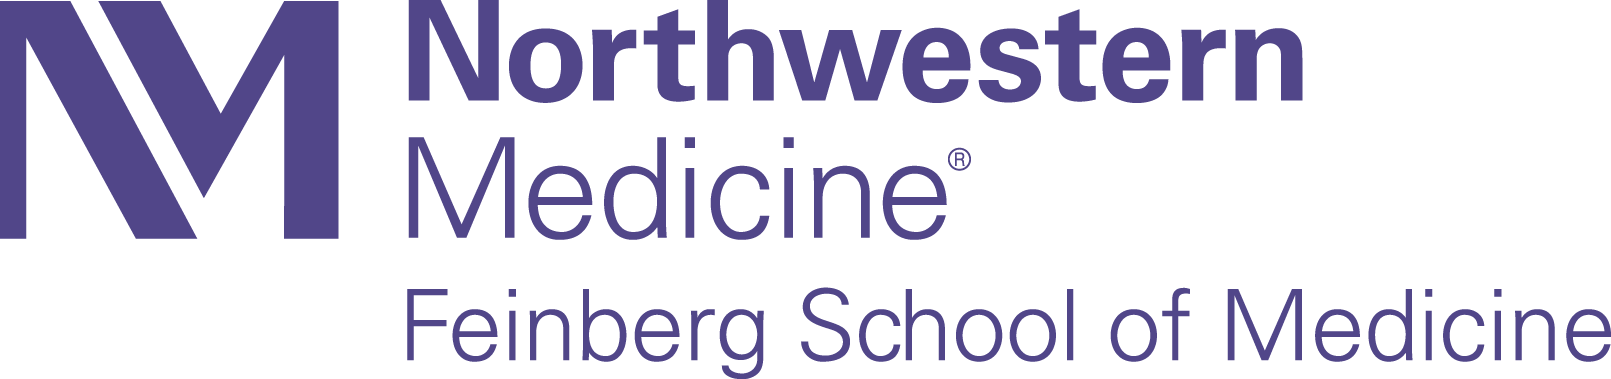 Northwestern University The Feinberg School of Medicine Interview Prep